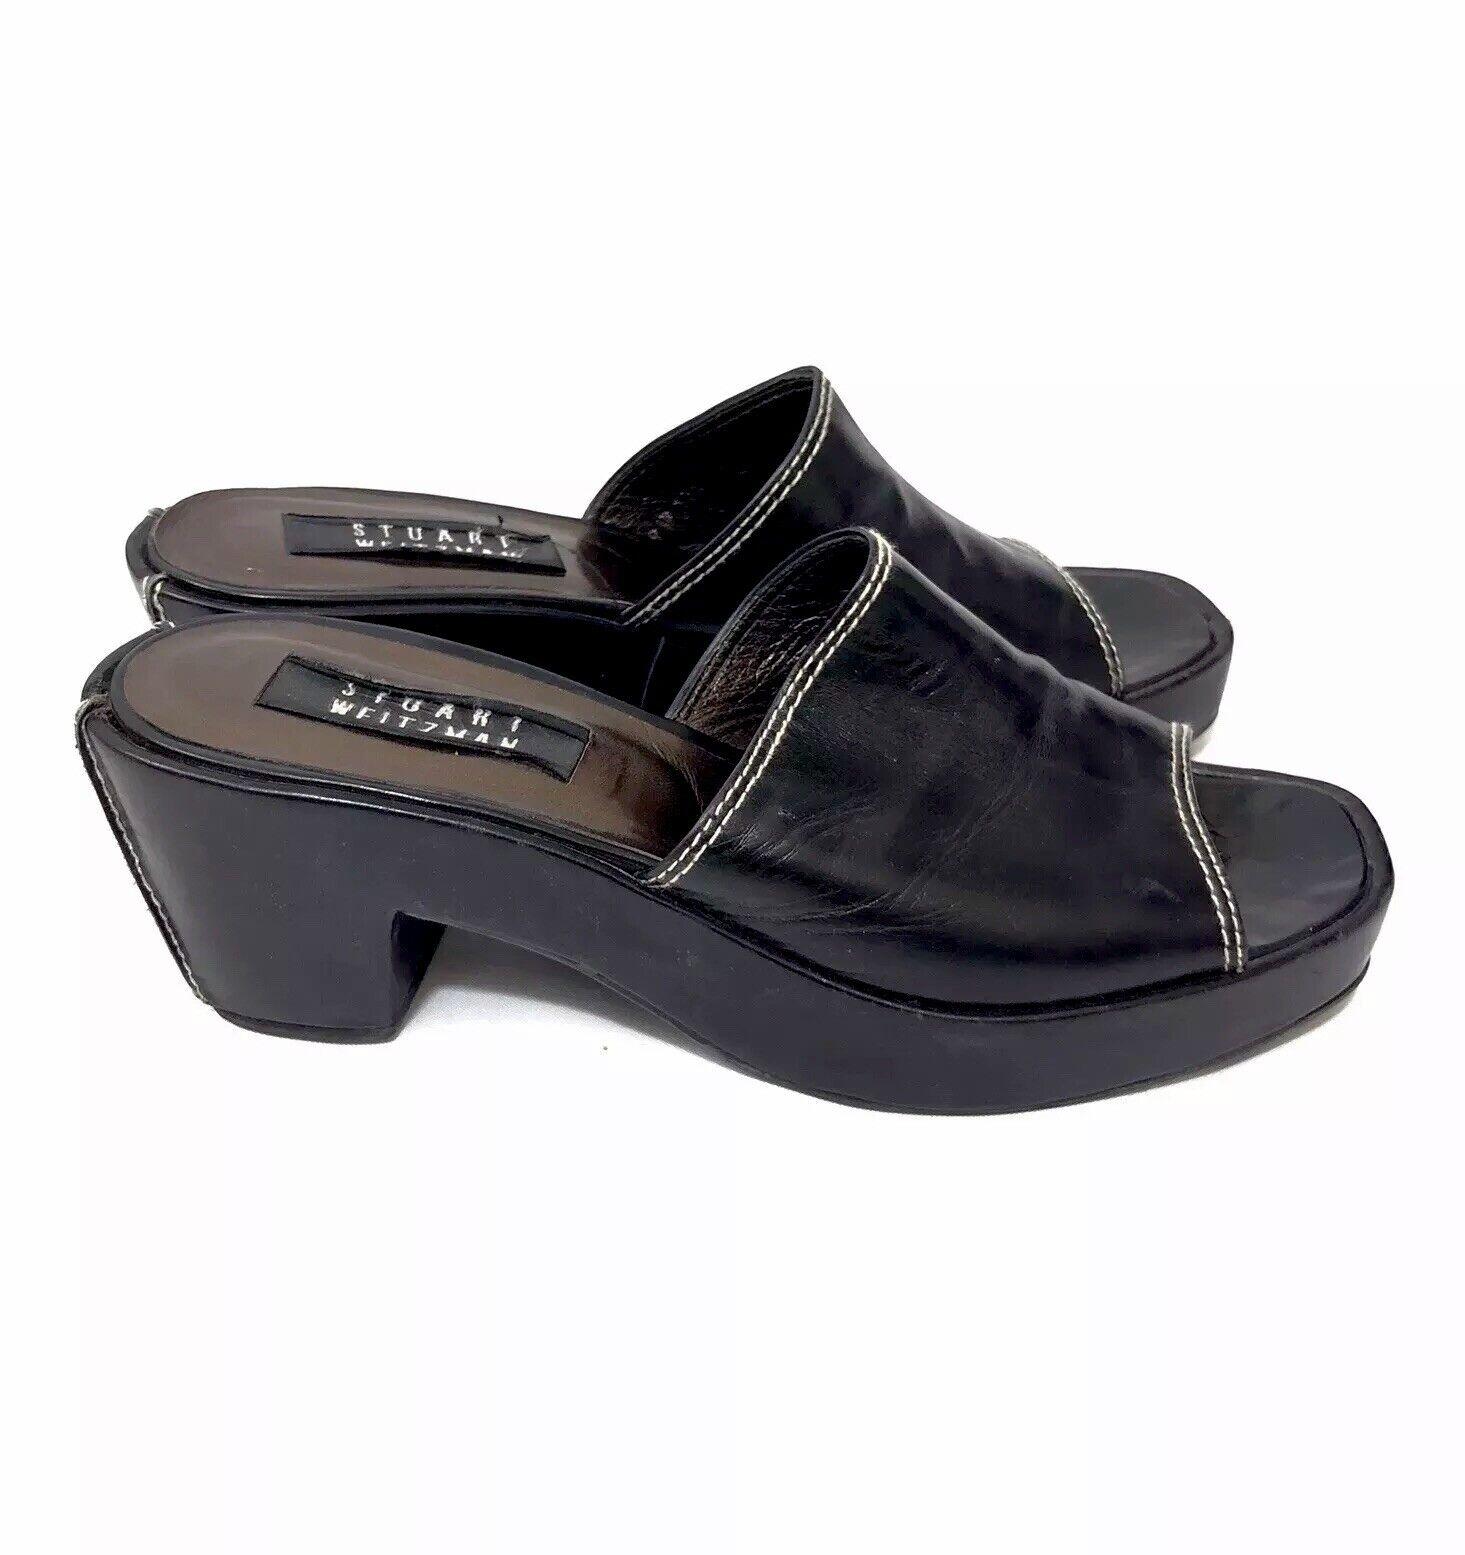 STUART WEITZMAN Black Leather Slide Sandals Platform Heels Sz 7 N Ivory Stitch